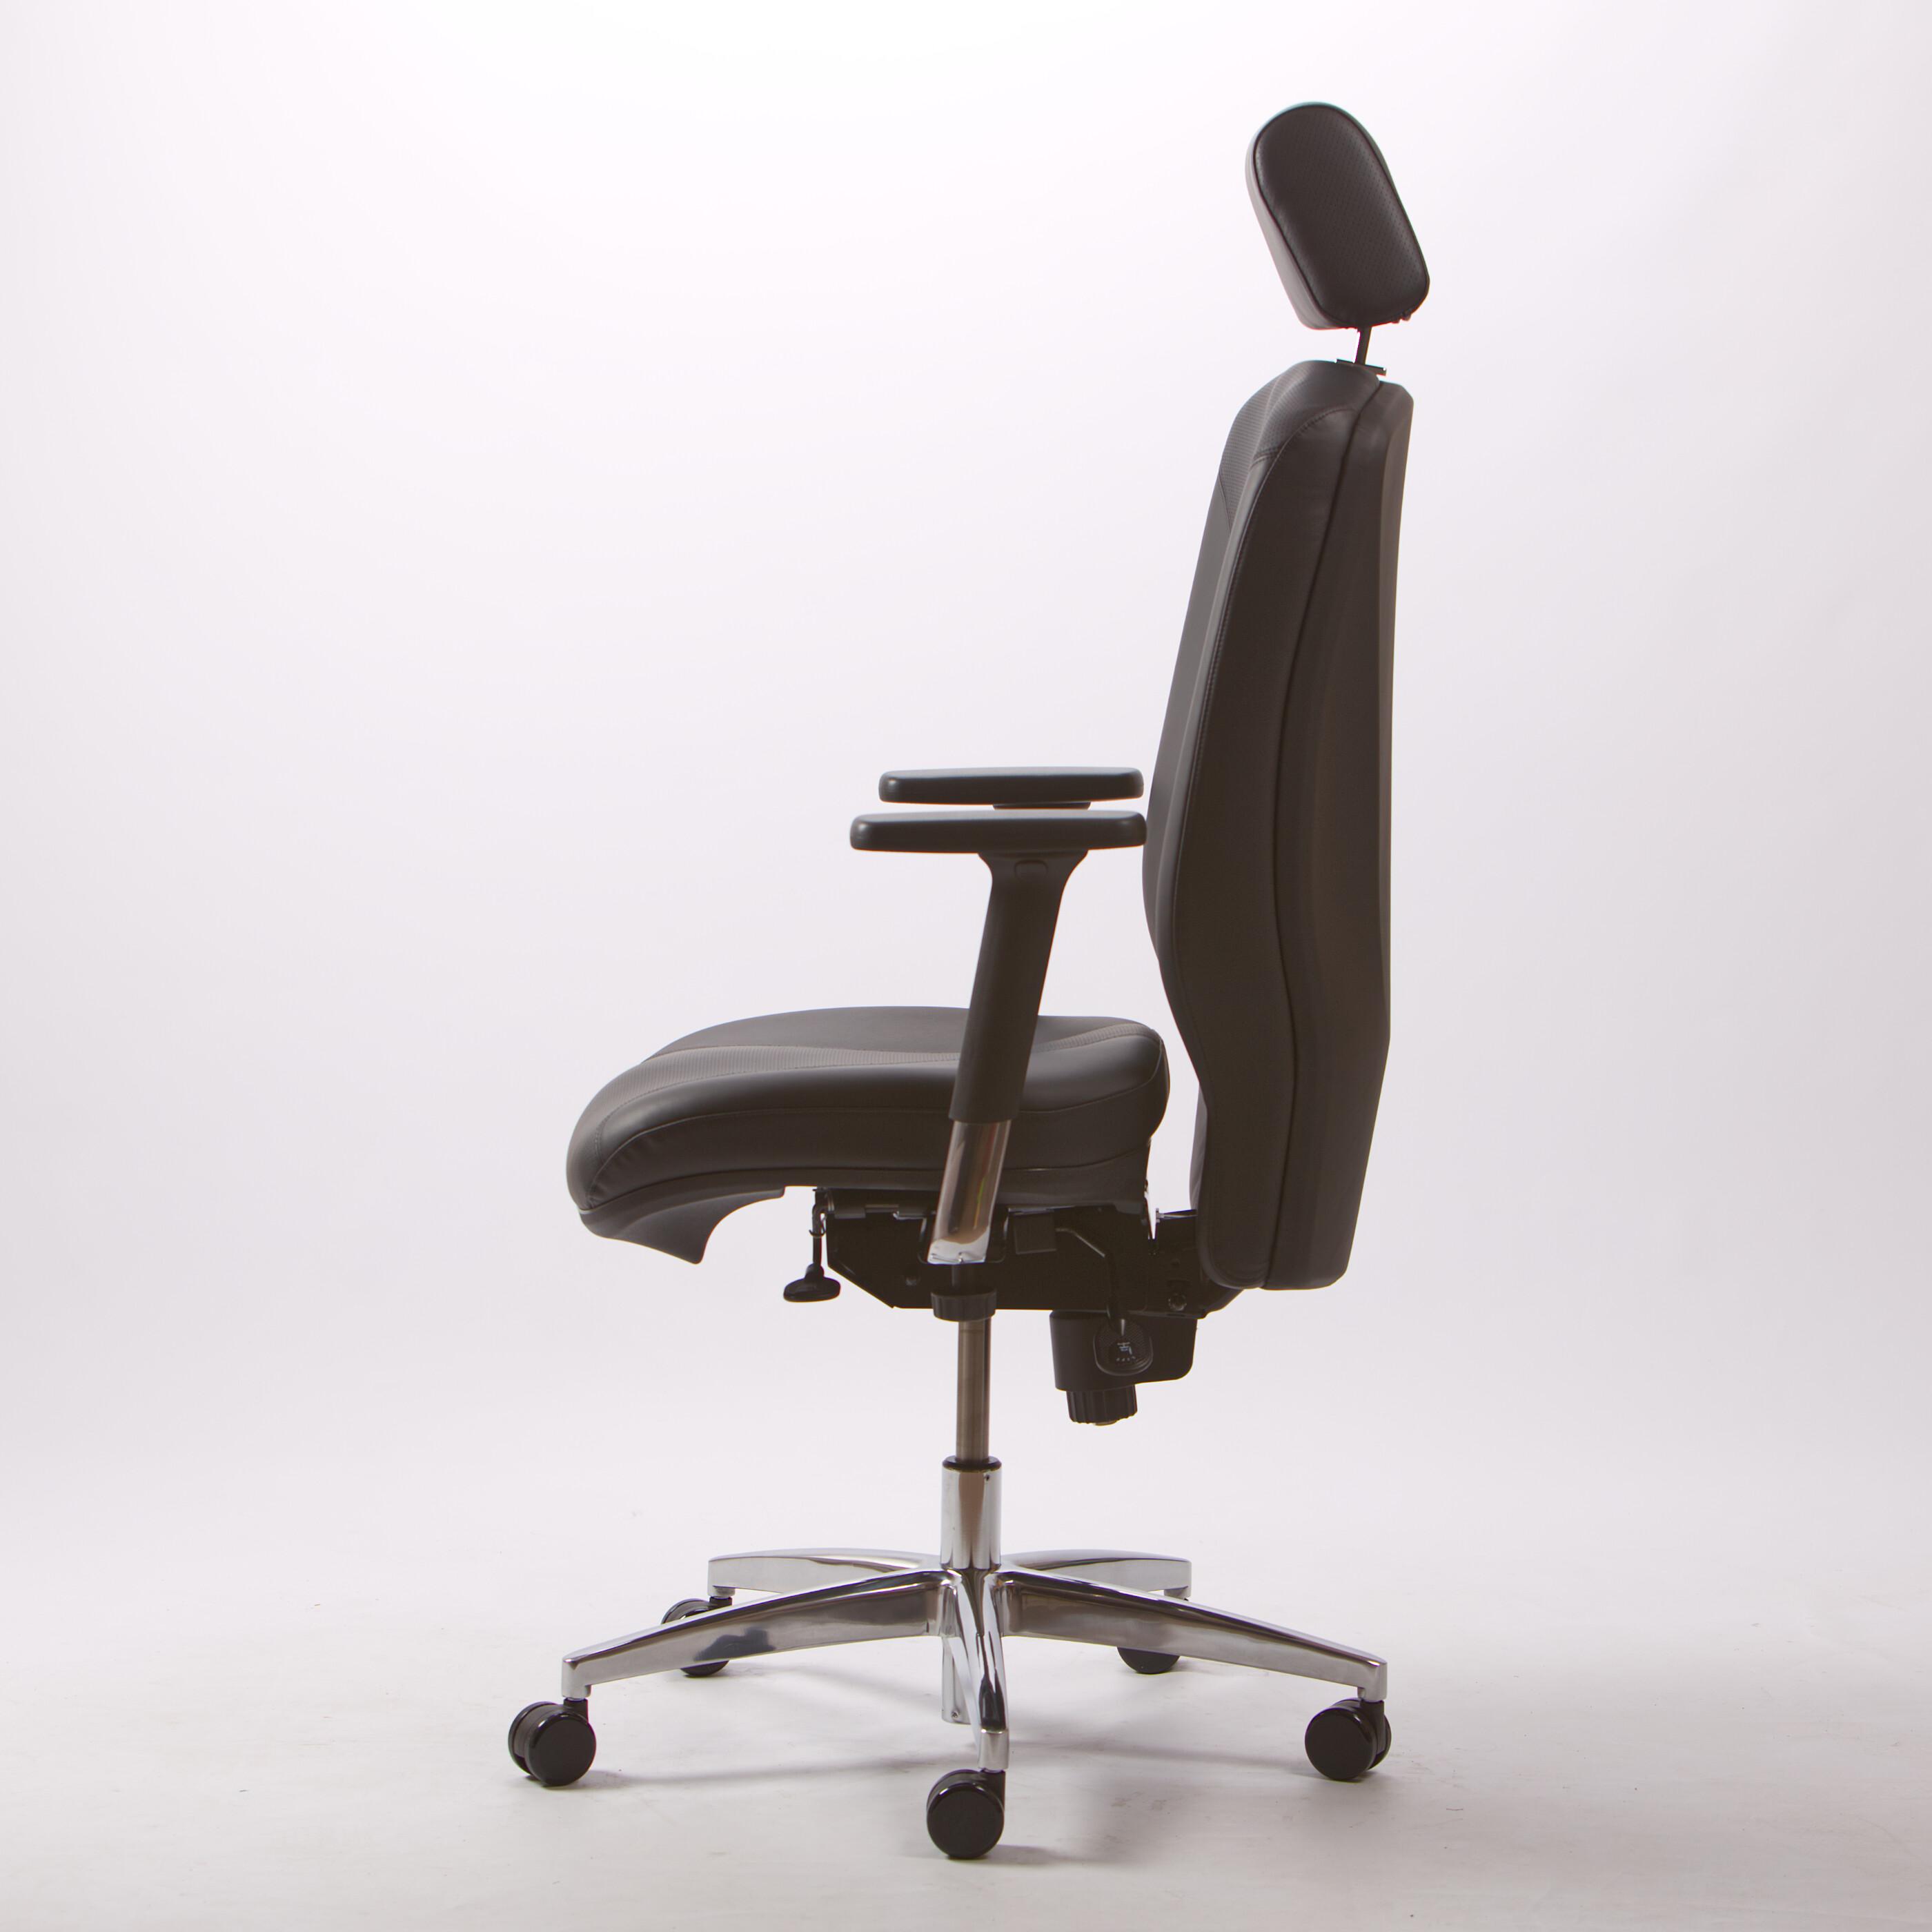 TERGON Bürostuhl T6.0 XL Ergoprotection 03